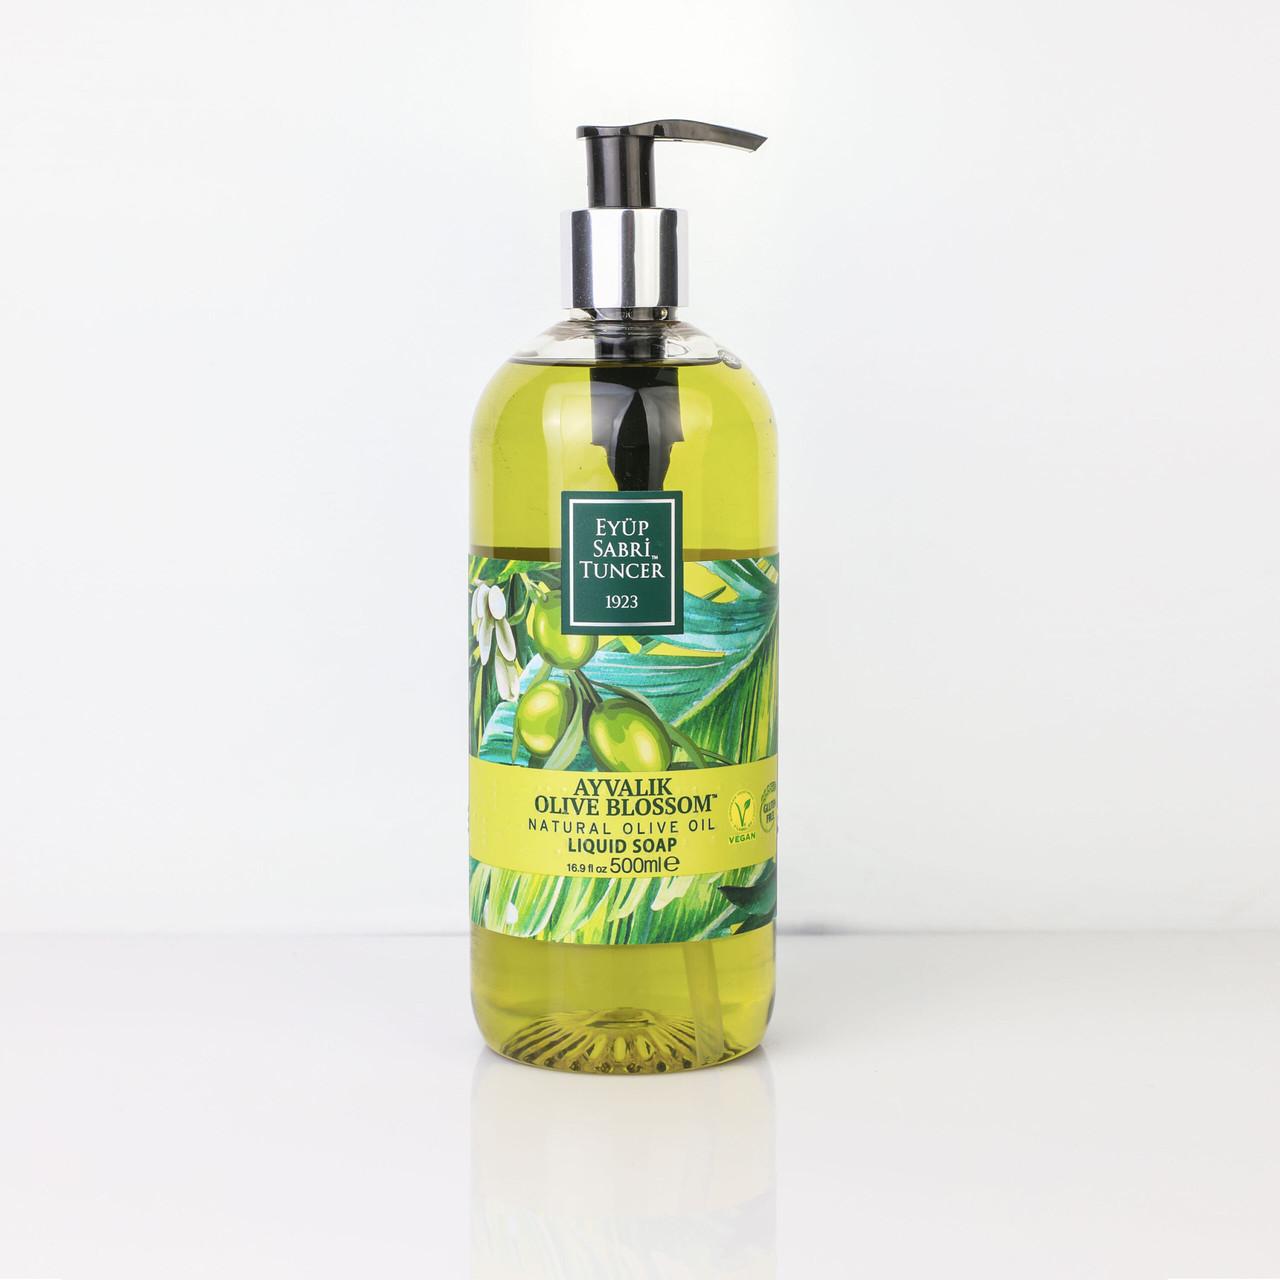 Жидкое мыло для рук Ayvalik Olive Blossom  Eyup Sabri Tuncer